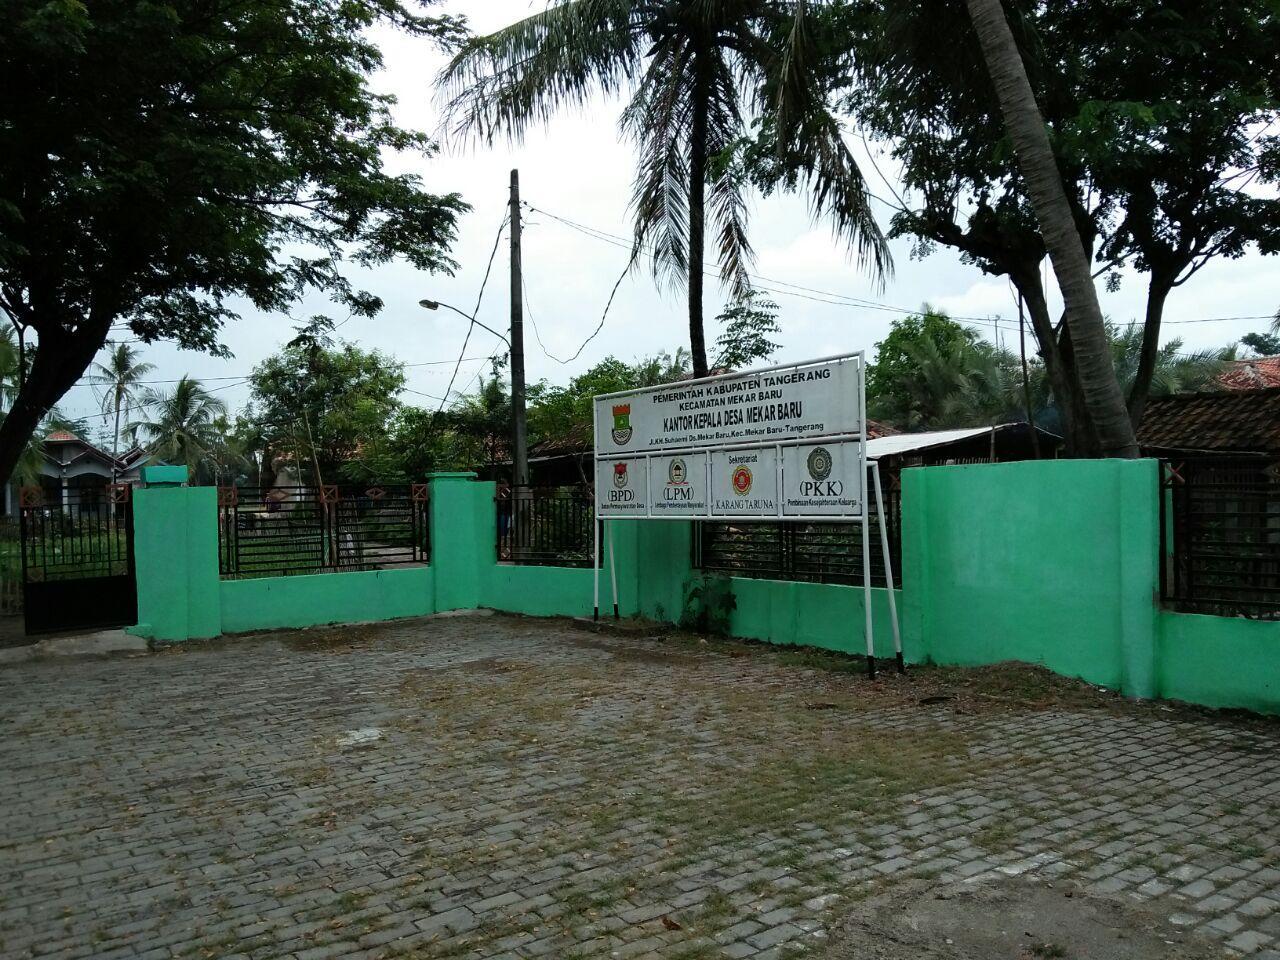 Prona Desa Mekar Baru Kab Tangerang Diduga Beraroma Pungli Rp 1 Juta Harapan Rakyat Online